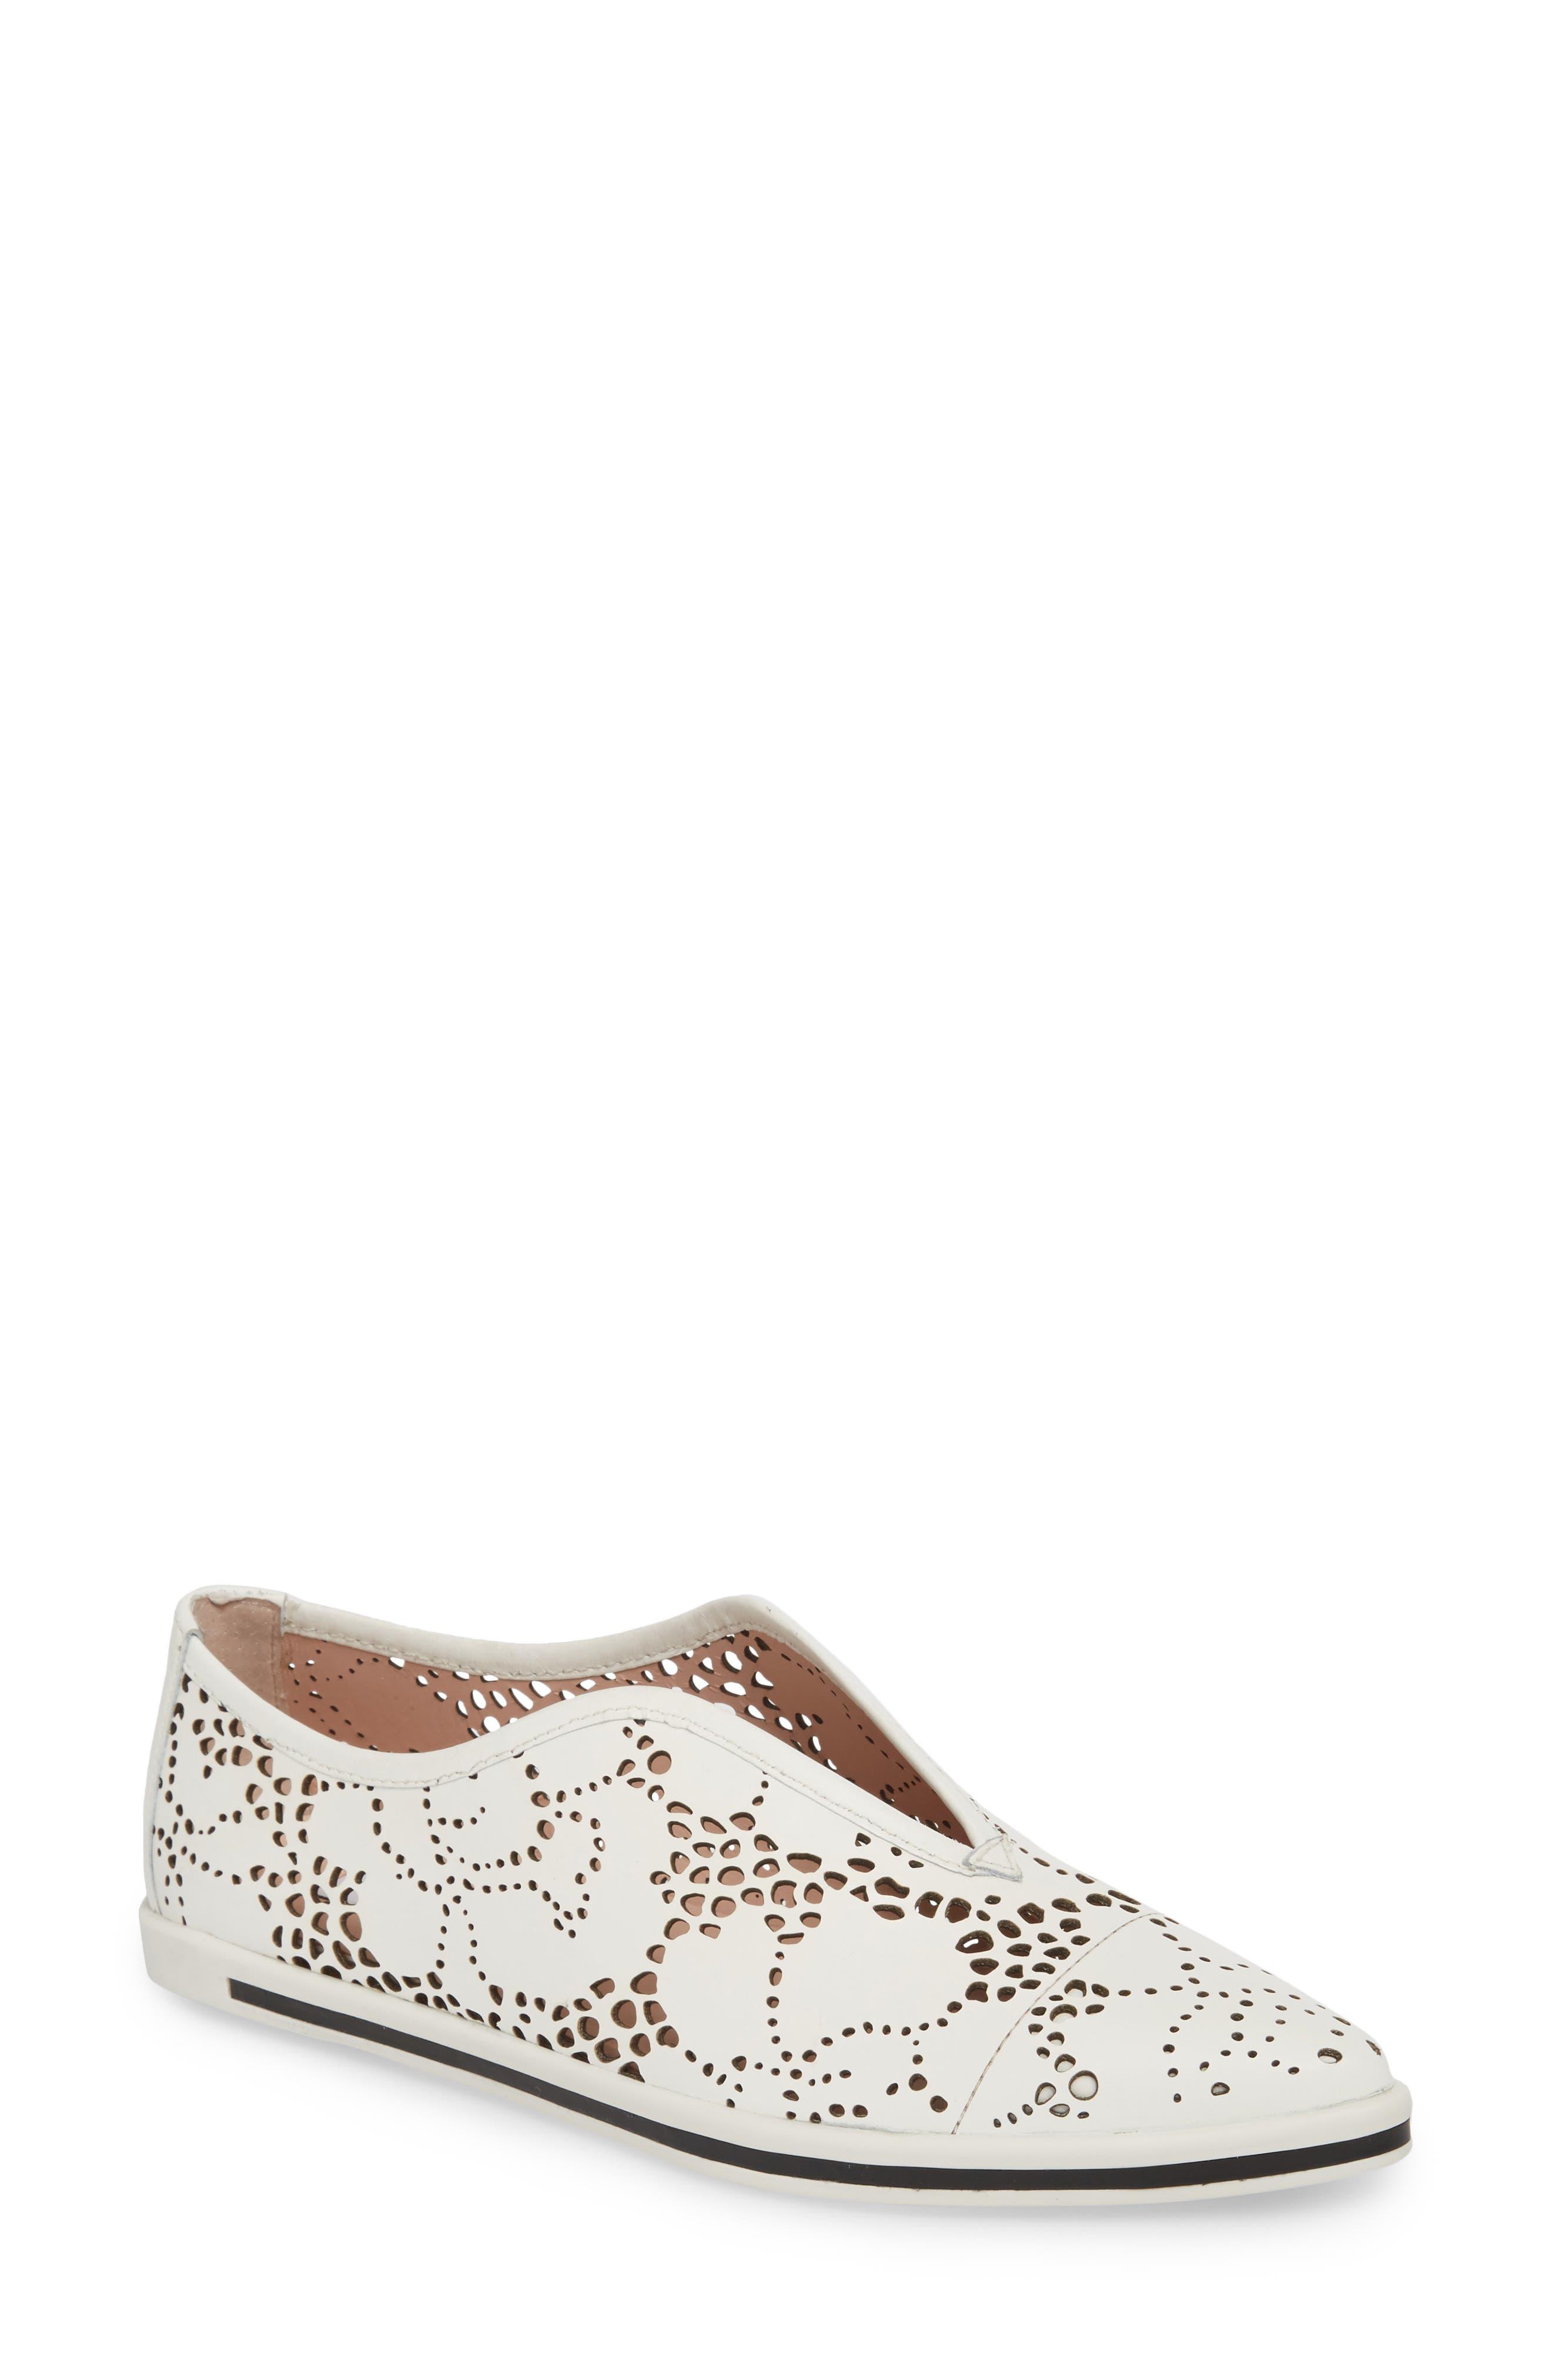 Tisha II Slip-On Sneaker,                         Main,                         color, White Leather